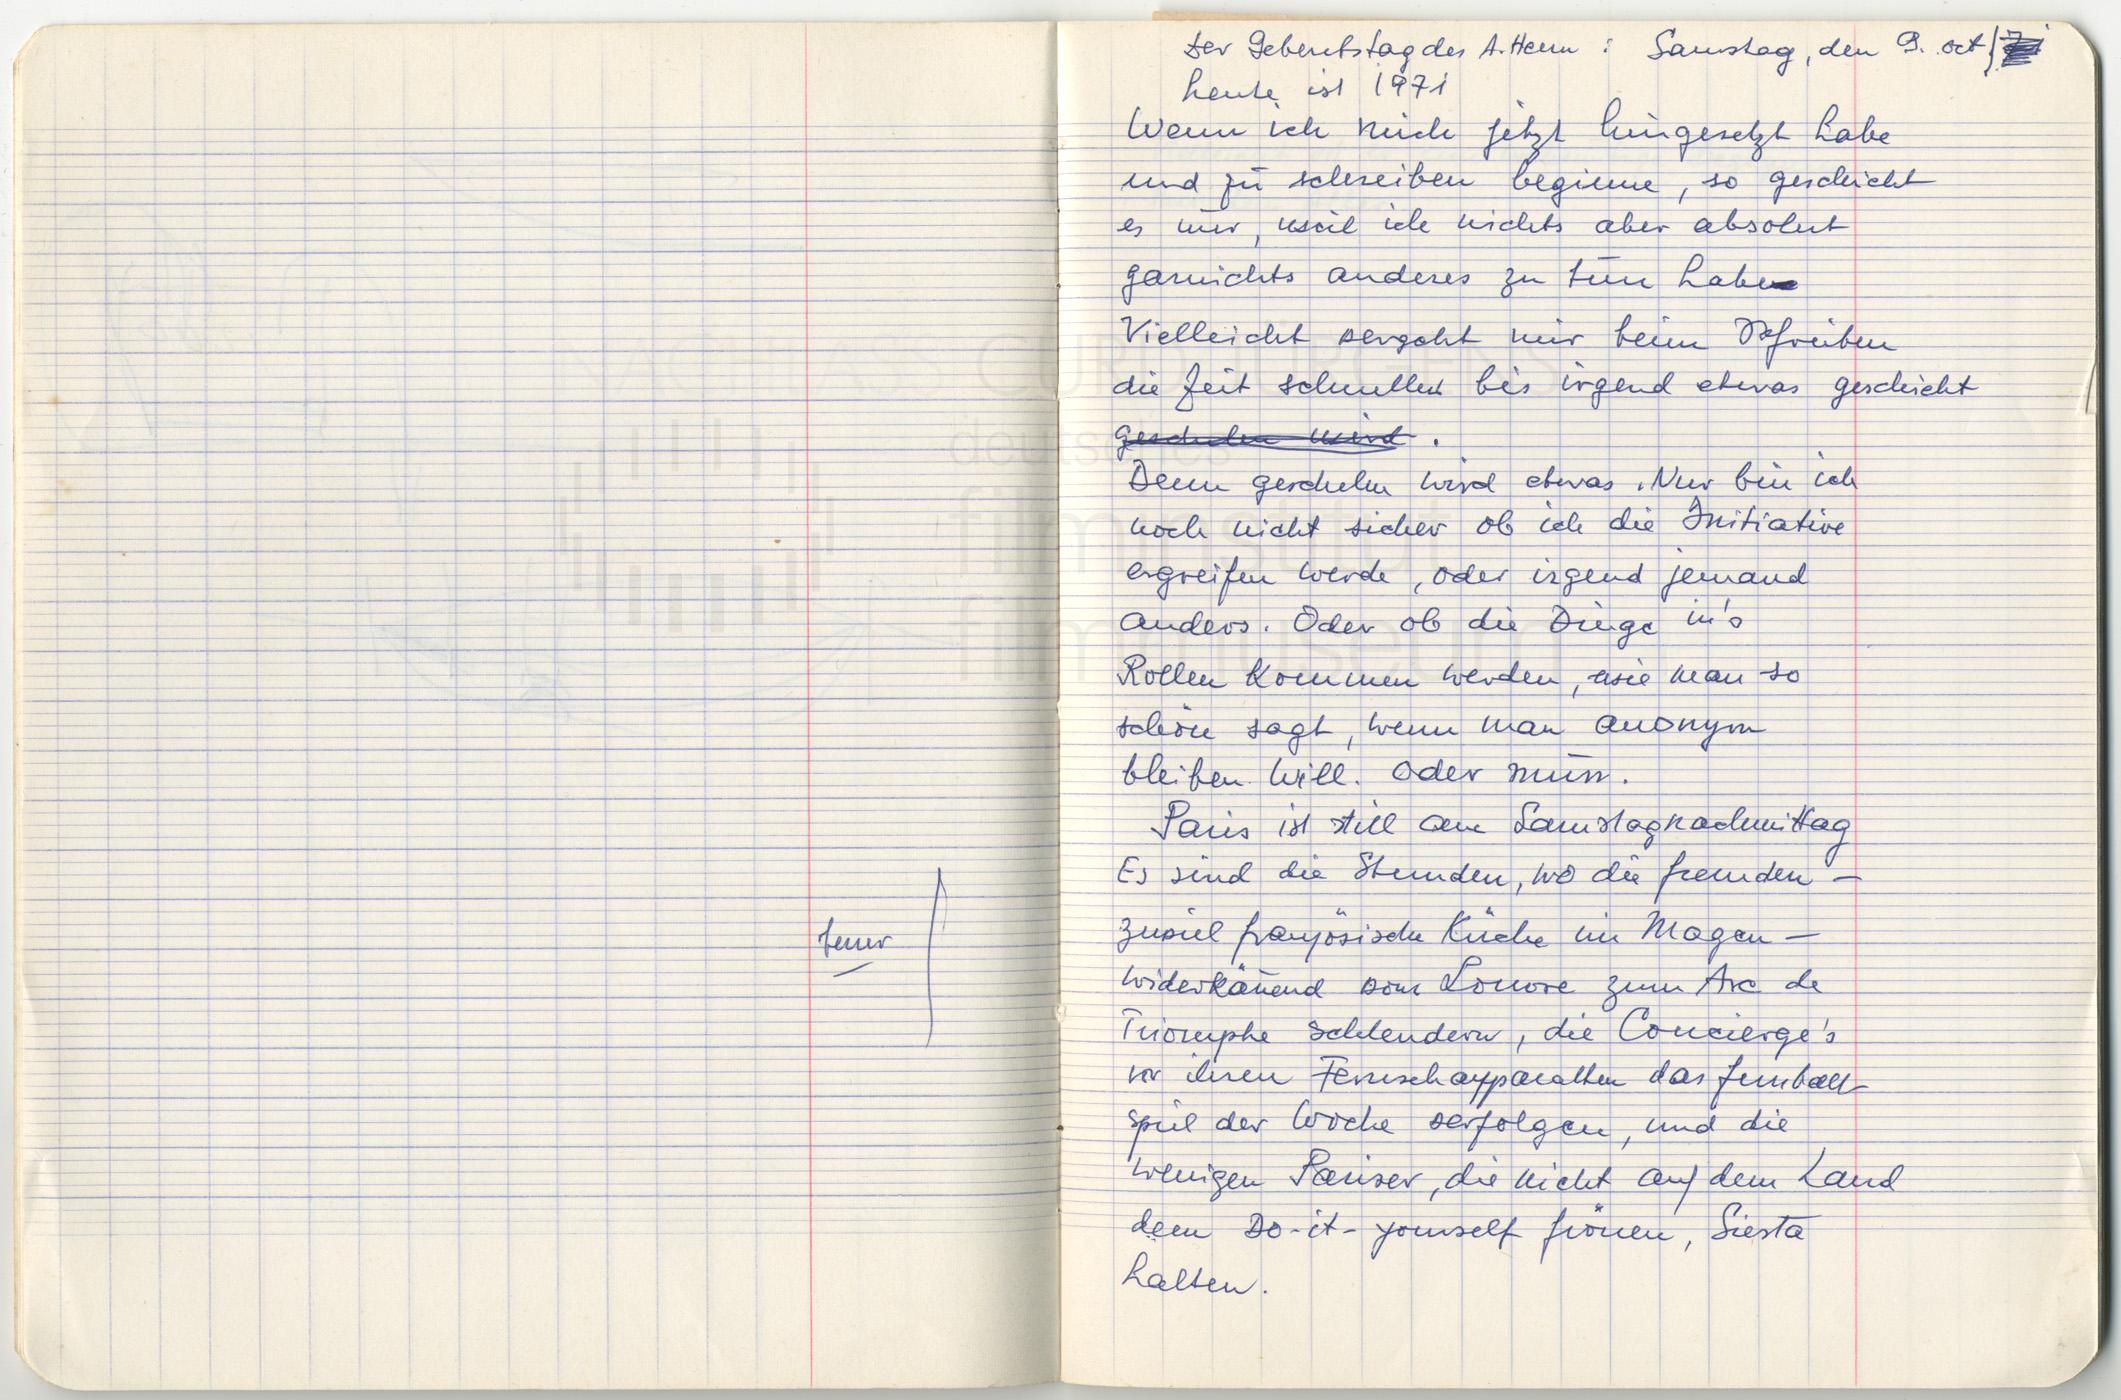 Tagebucheintrag vom 9.10.1971